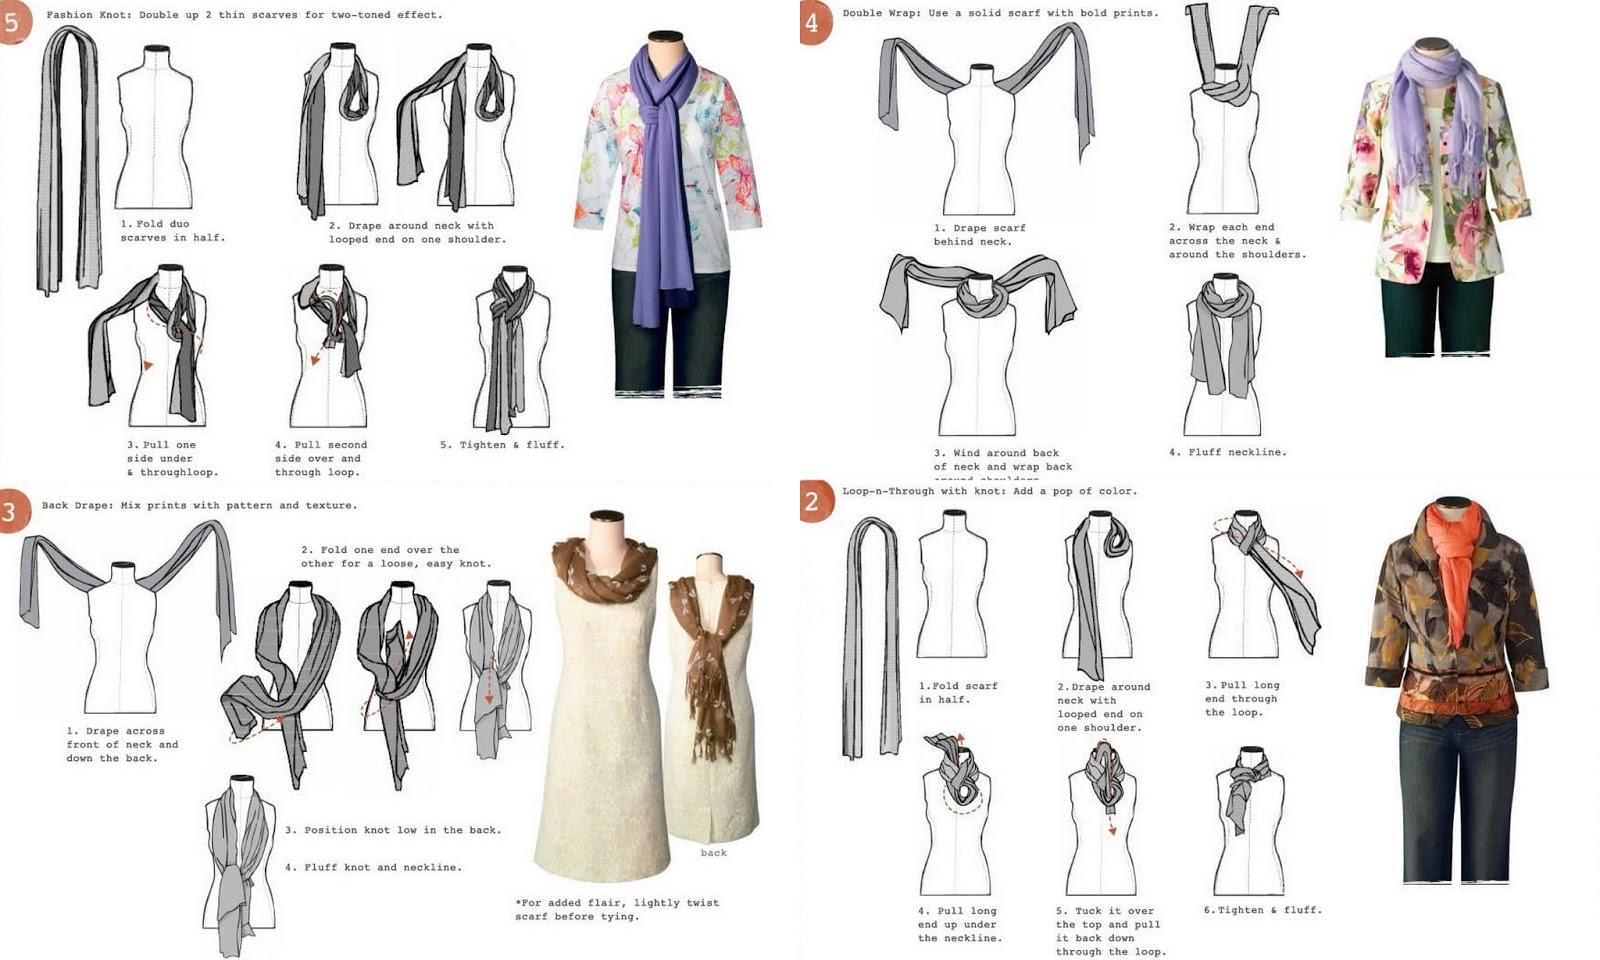 Варианты завязывания шарфа для мужчин на пальто фото пошагово